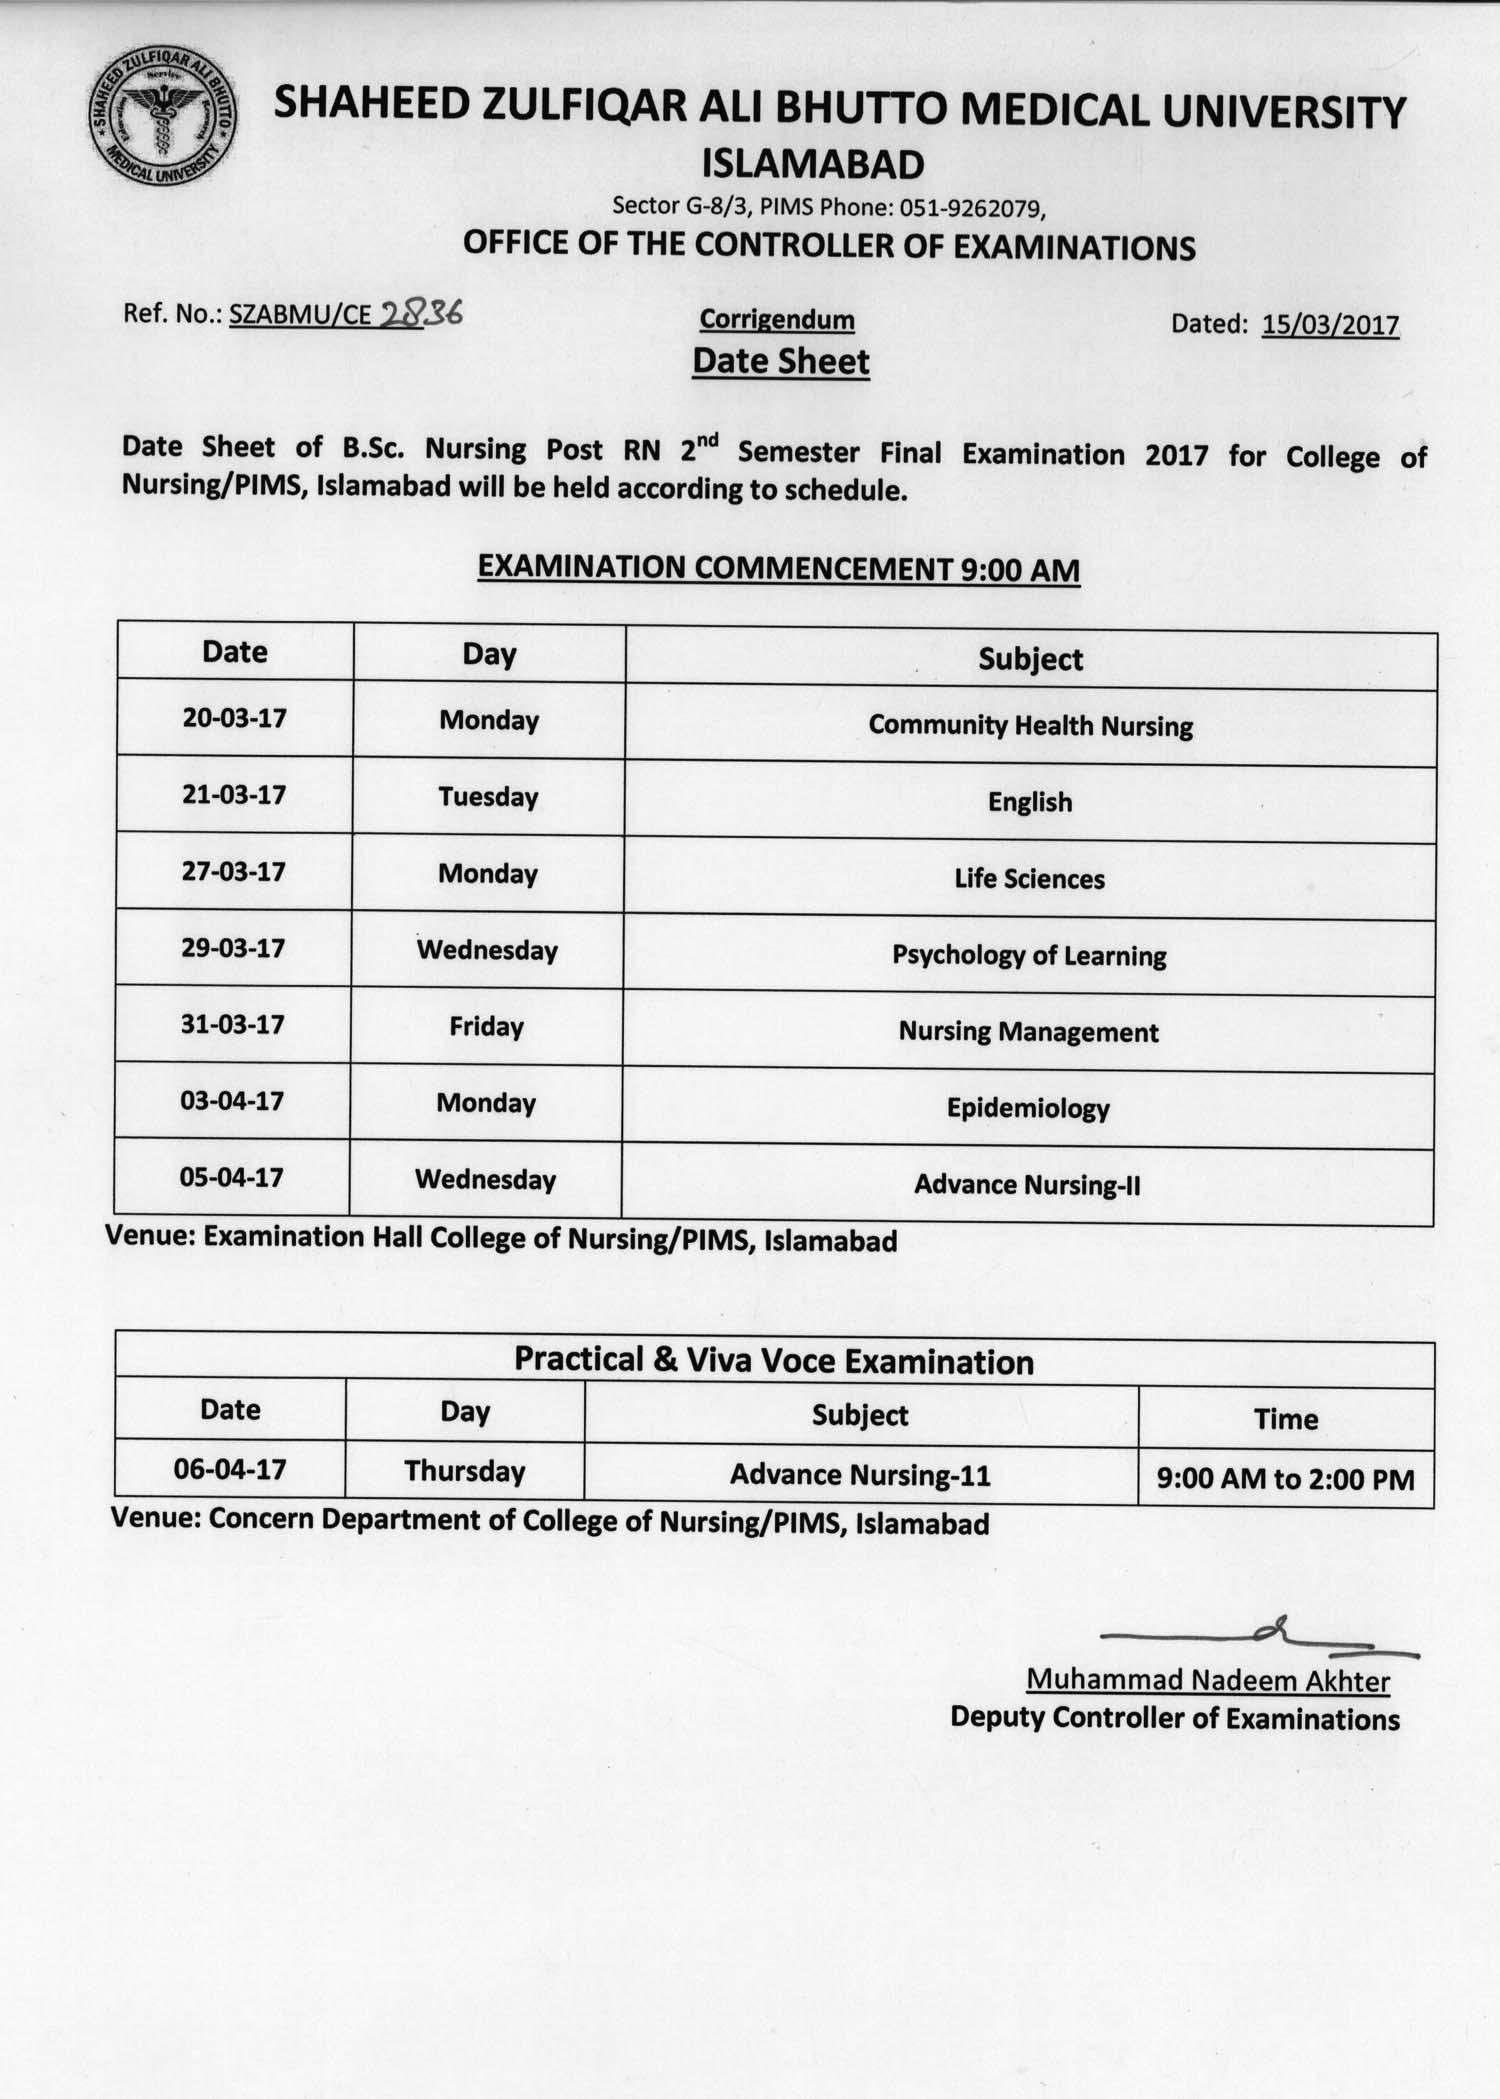 Date Sheet - B.Sc. Nursing Post RN 2nd & 4th Semester Final Exams 2016